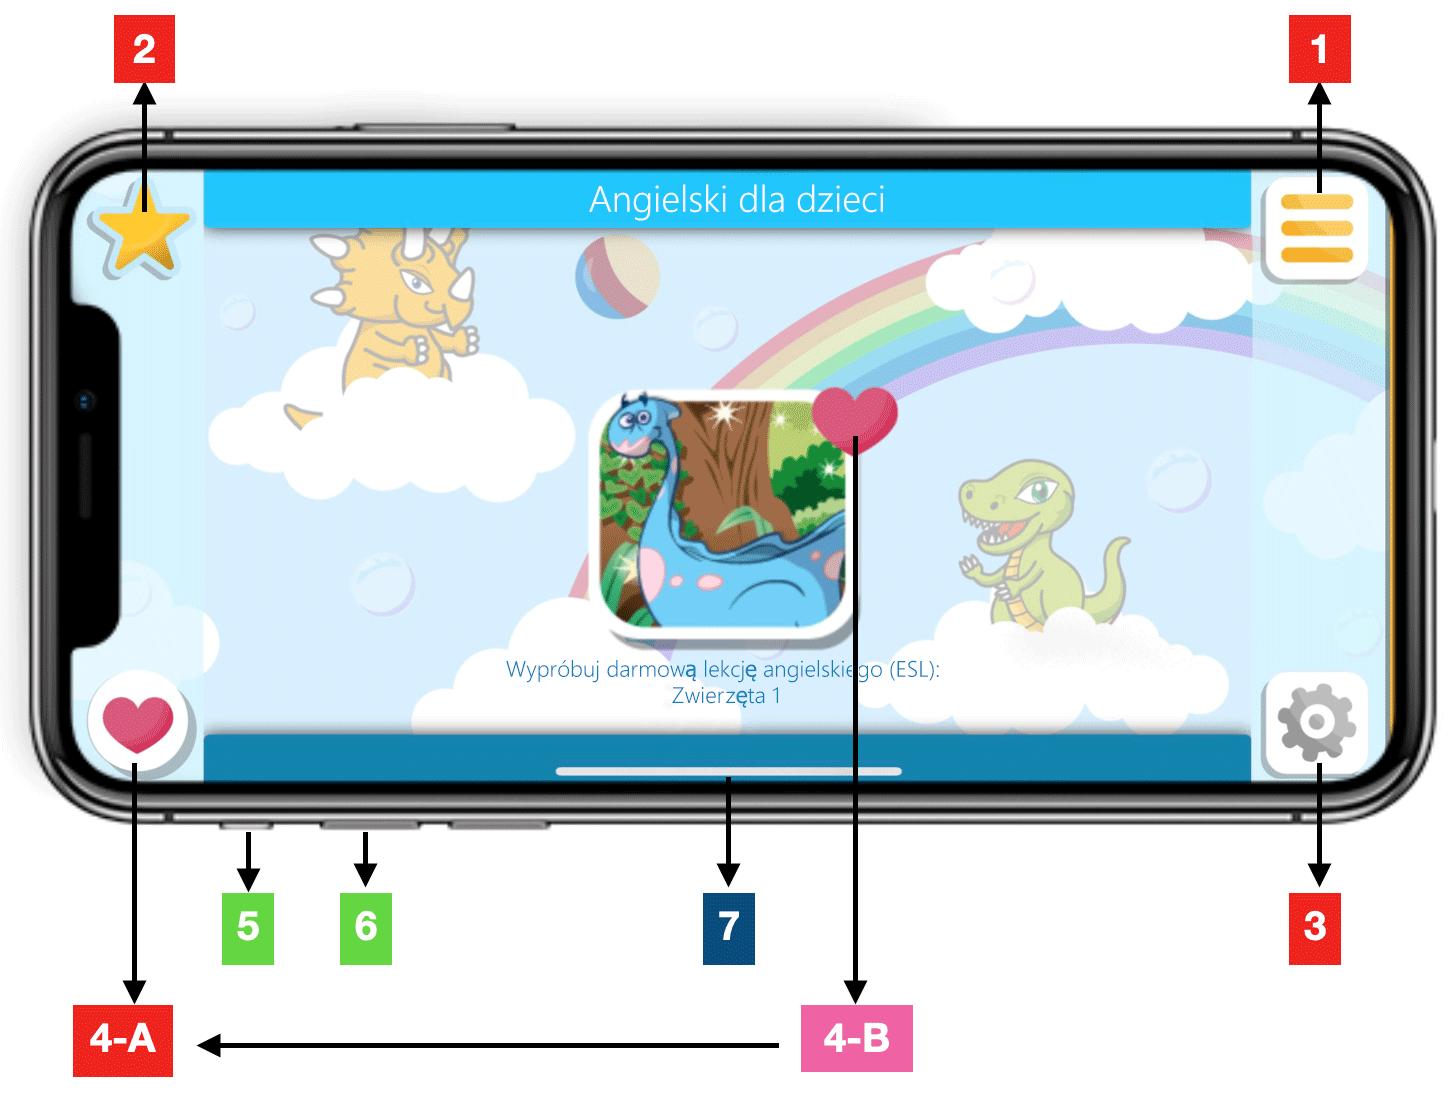 dinolingo-app-instructions-pl